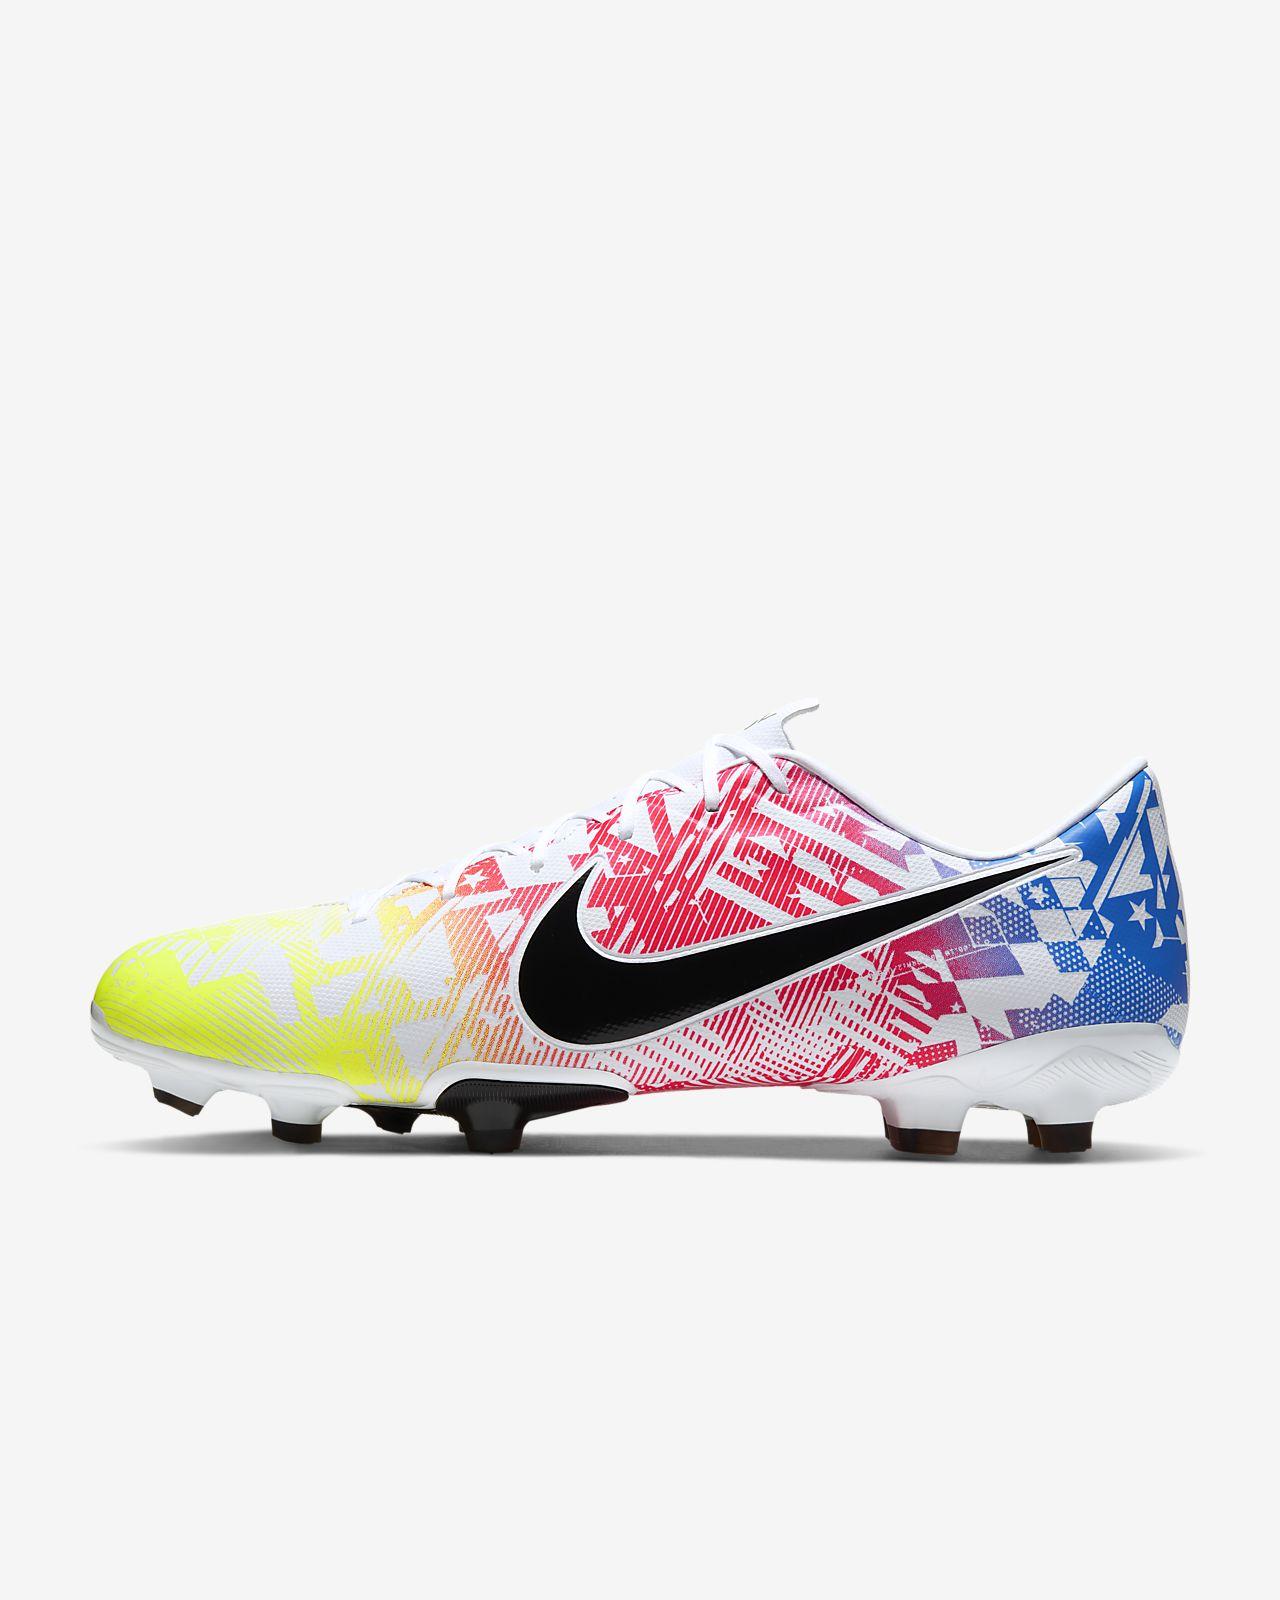 Chaussure de football multi surfaces à crampons Nike Mercurial Vapor 13 Academy Neymar Jr. MG